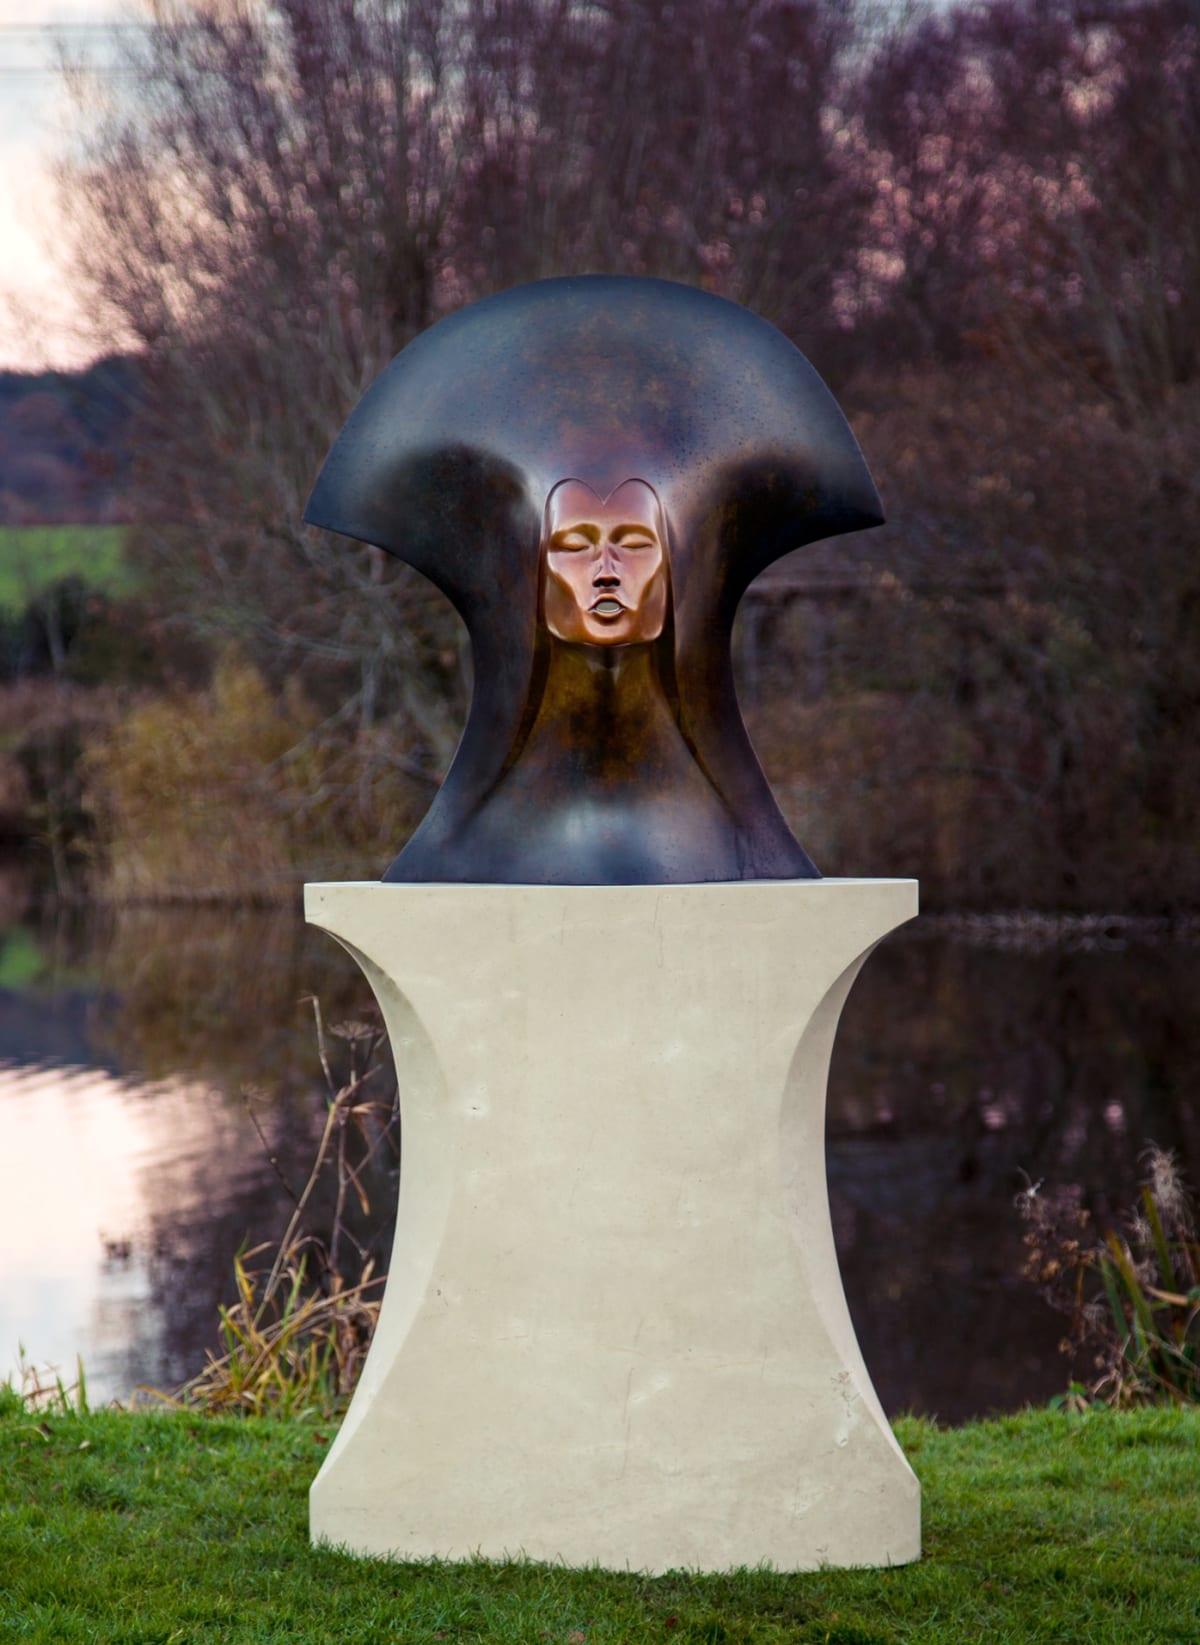 Simon Gudgeon Whispering Spirit, 2018 Bronze Sculpture 88 x 86 x 40 cm 34 5/8 x 33 7/8 x 15 3/4 in Edition 2 of 9